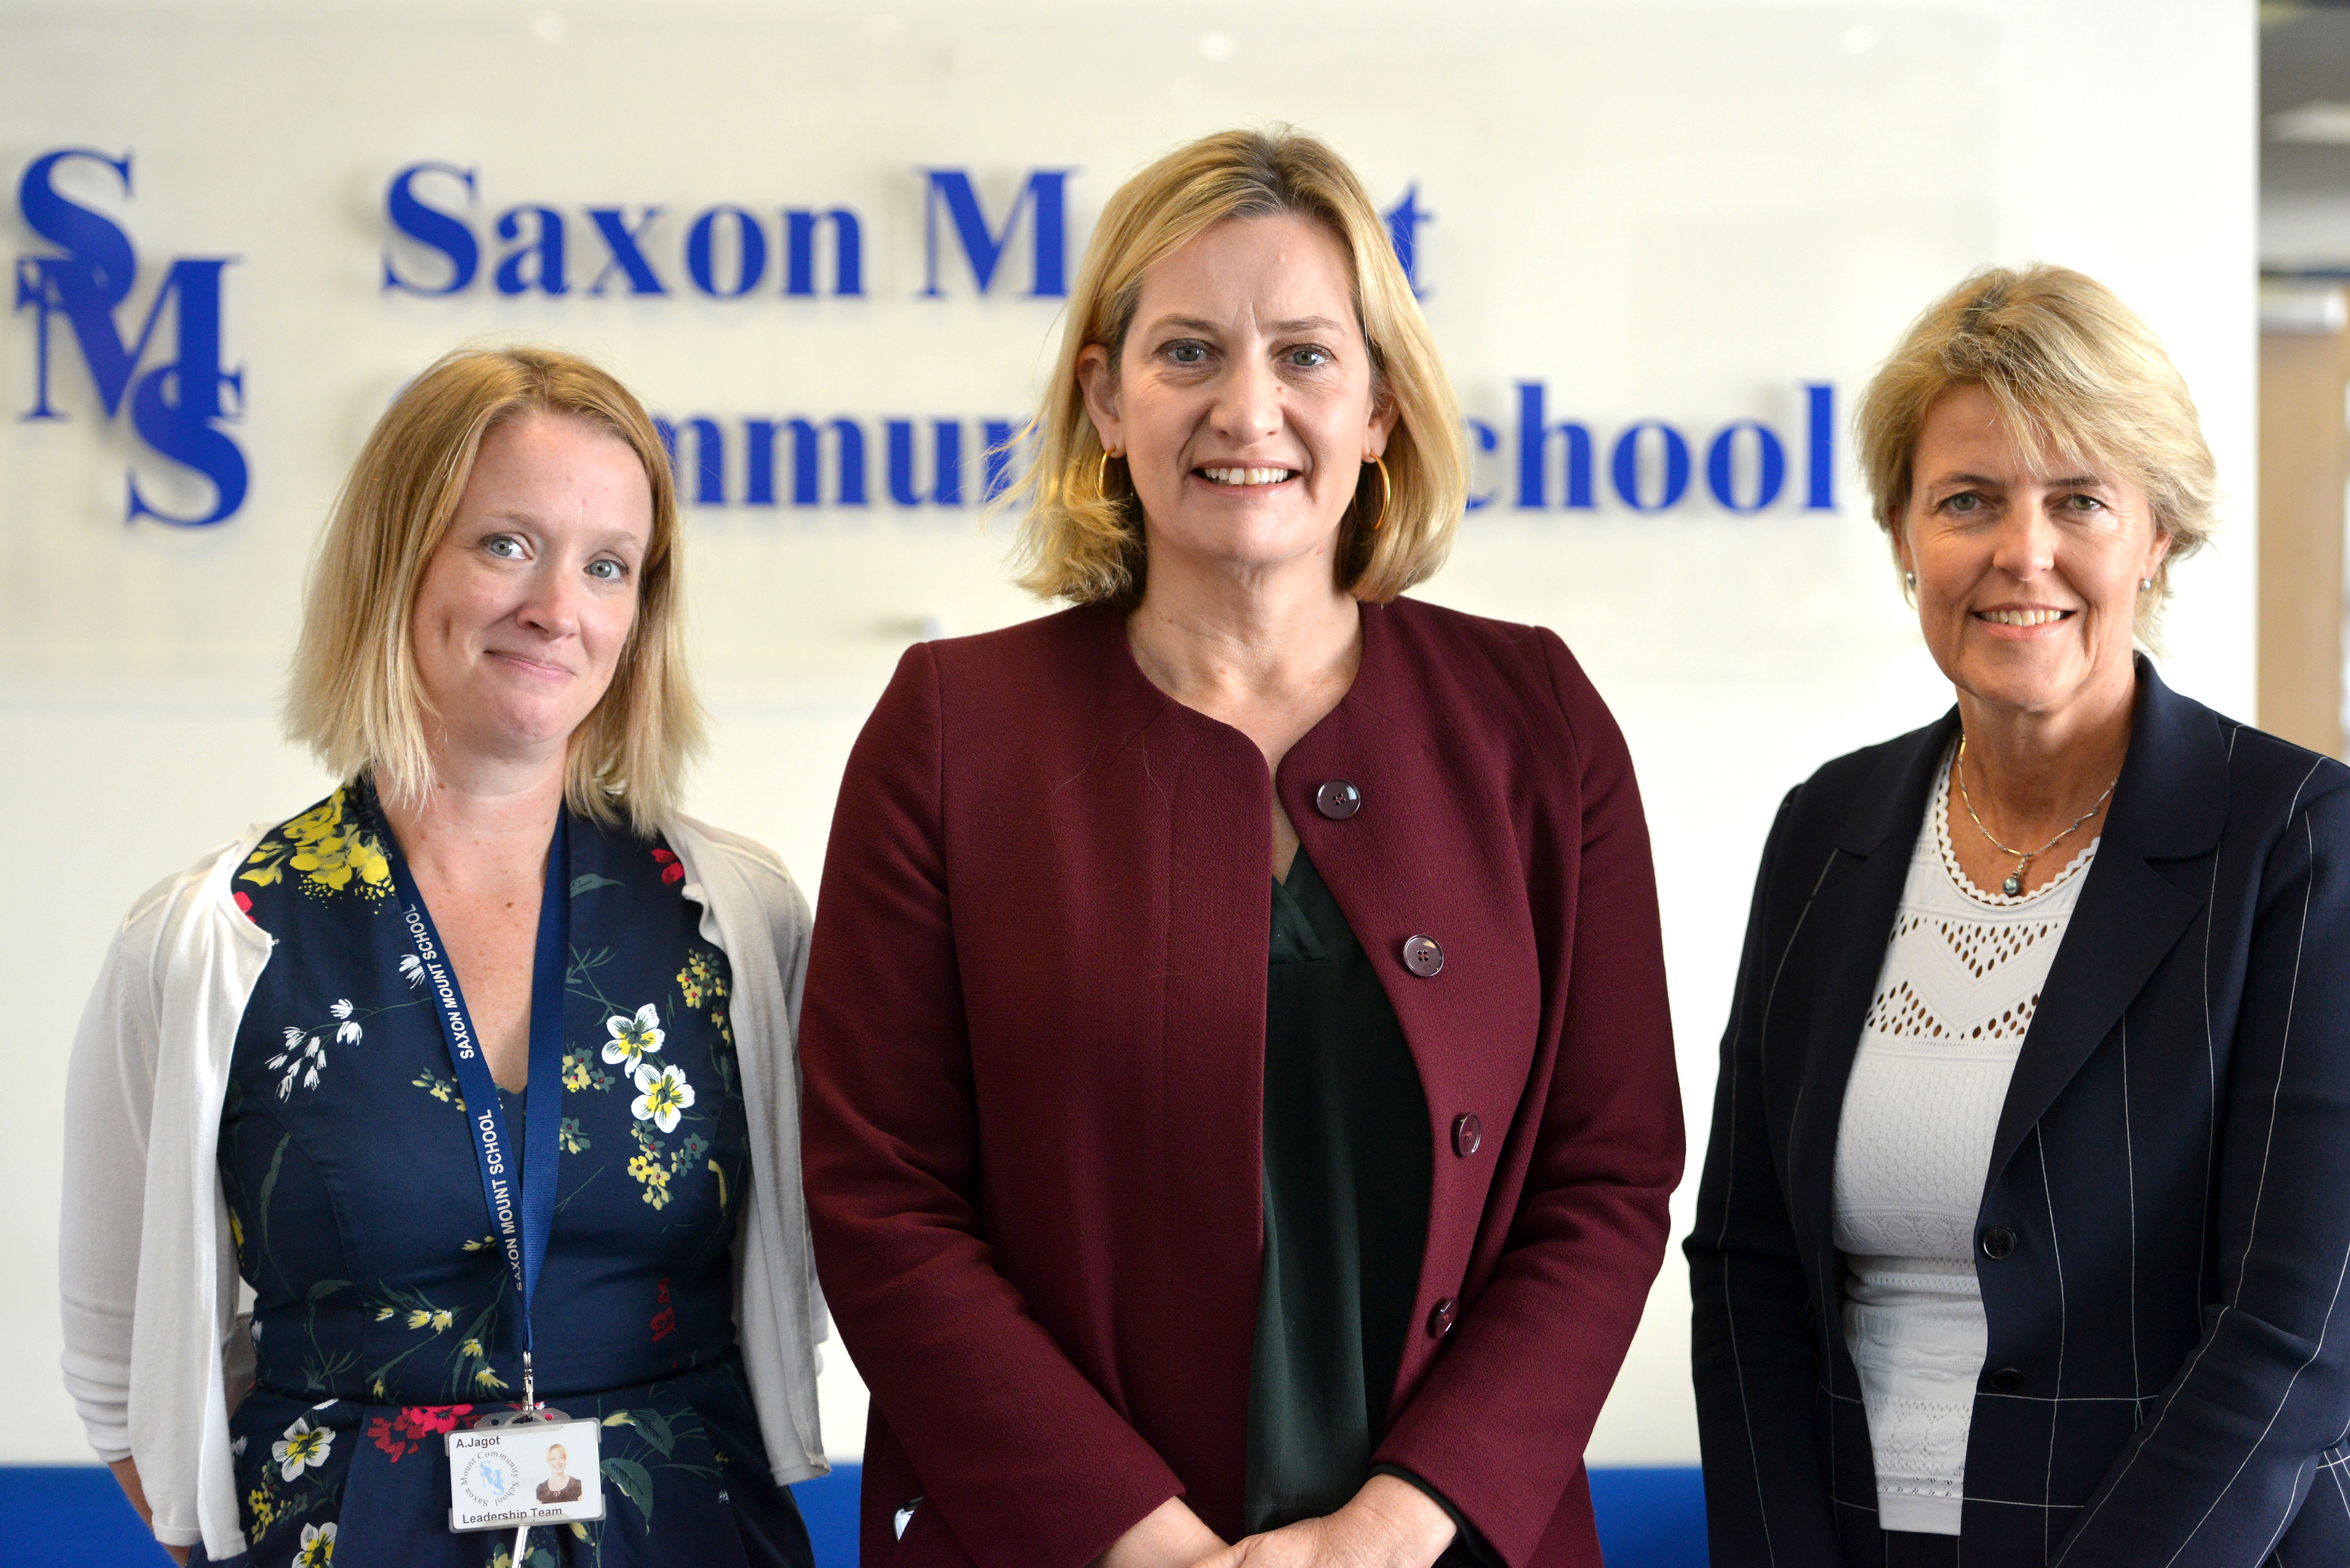 Amber at Saxon Mount School